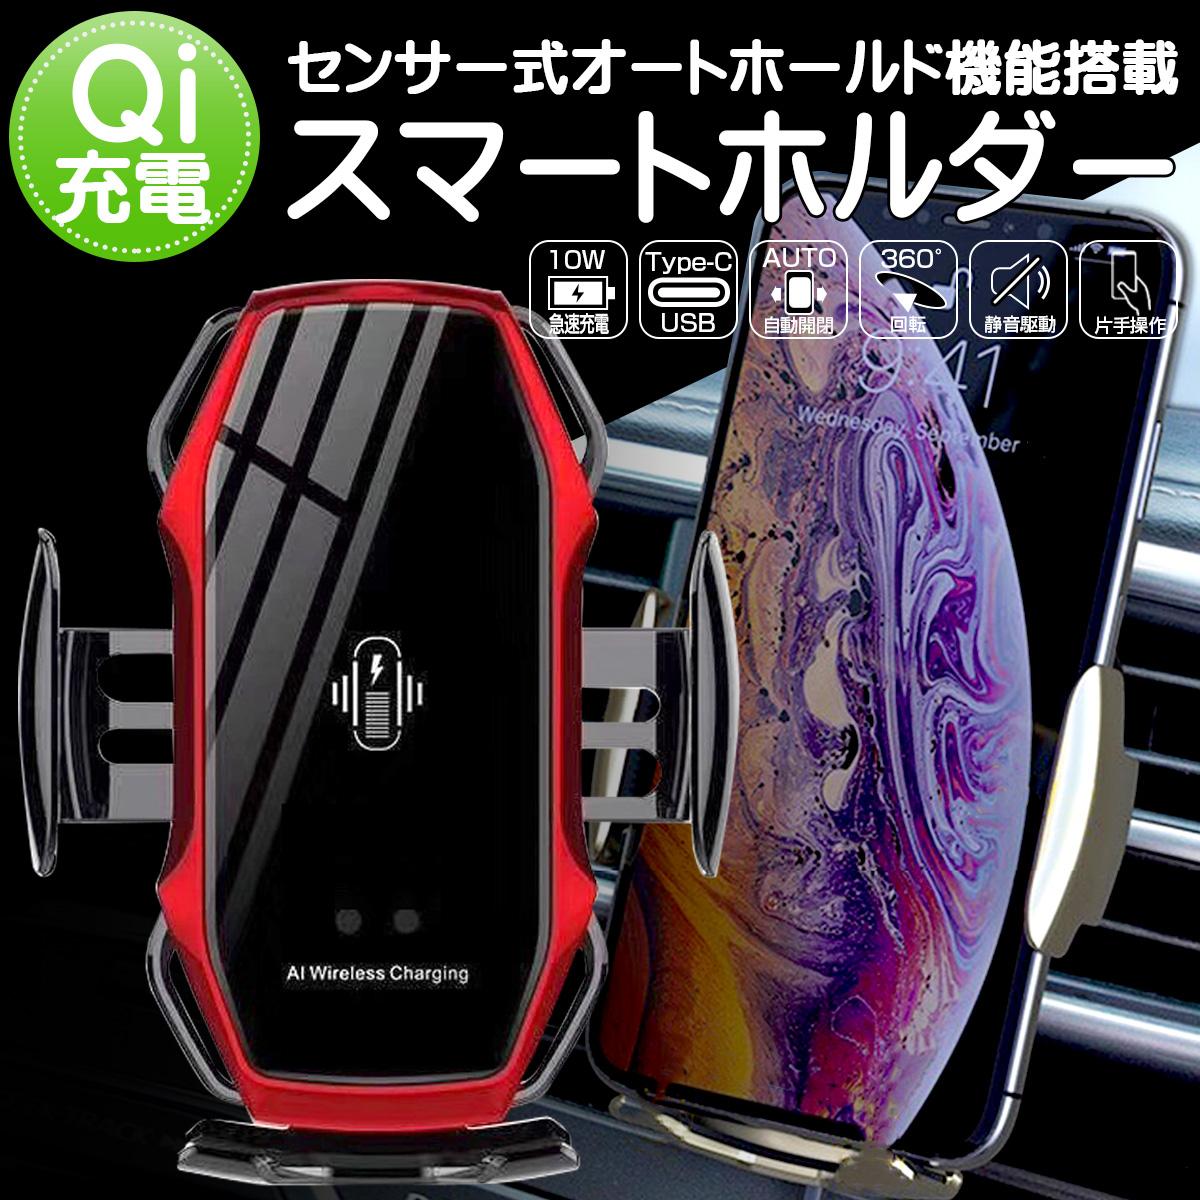 Qi ワイヤレス充電 車載器 スマートフォン ホルダー MAX10W 静音 オート 自動開閉 5色 USB TYPE-C スマホ 携帯 Y-102